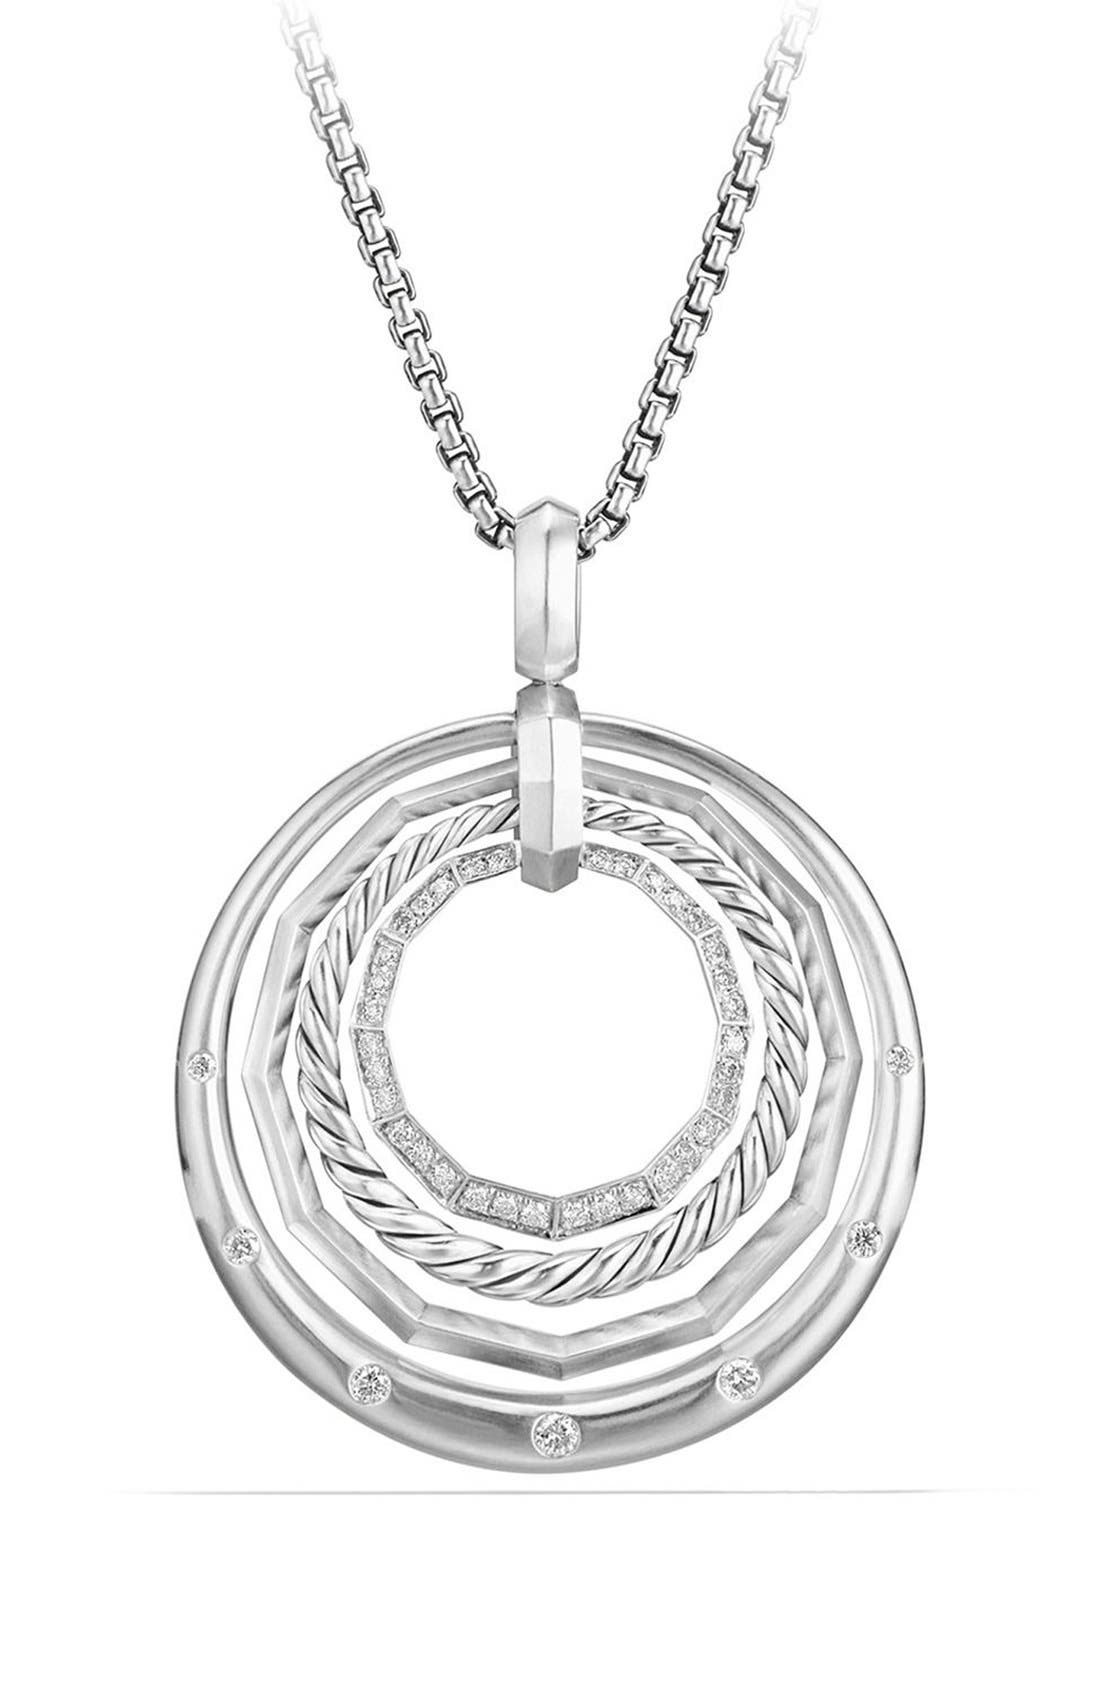 Main Image - David Yurman Stax Diamond Pendant Necklace